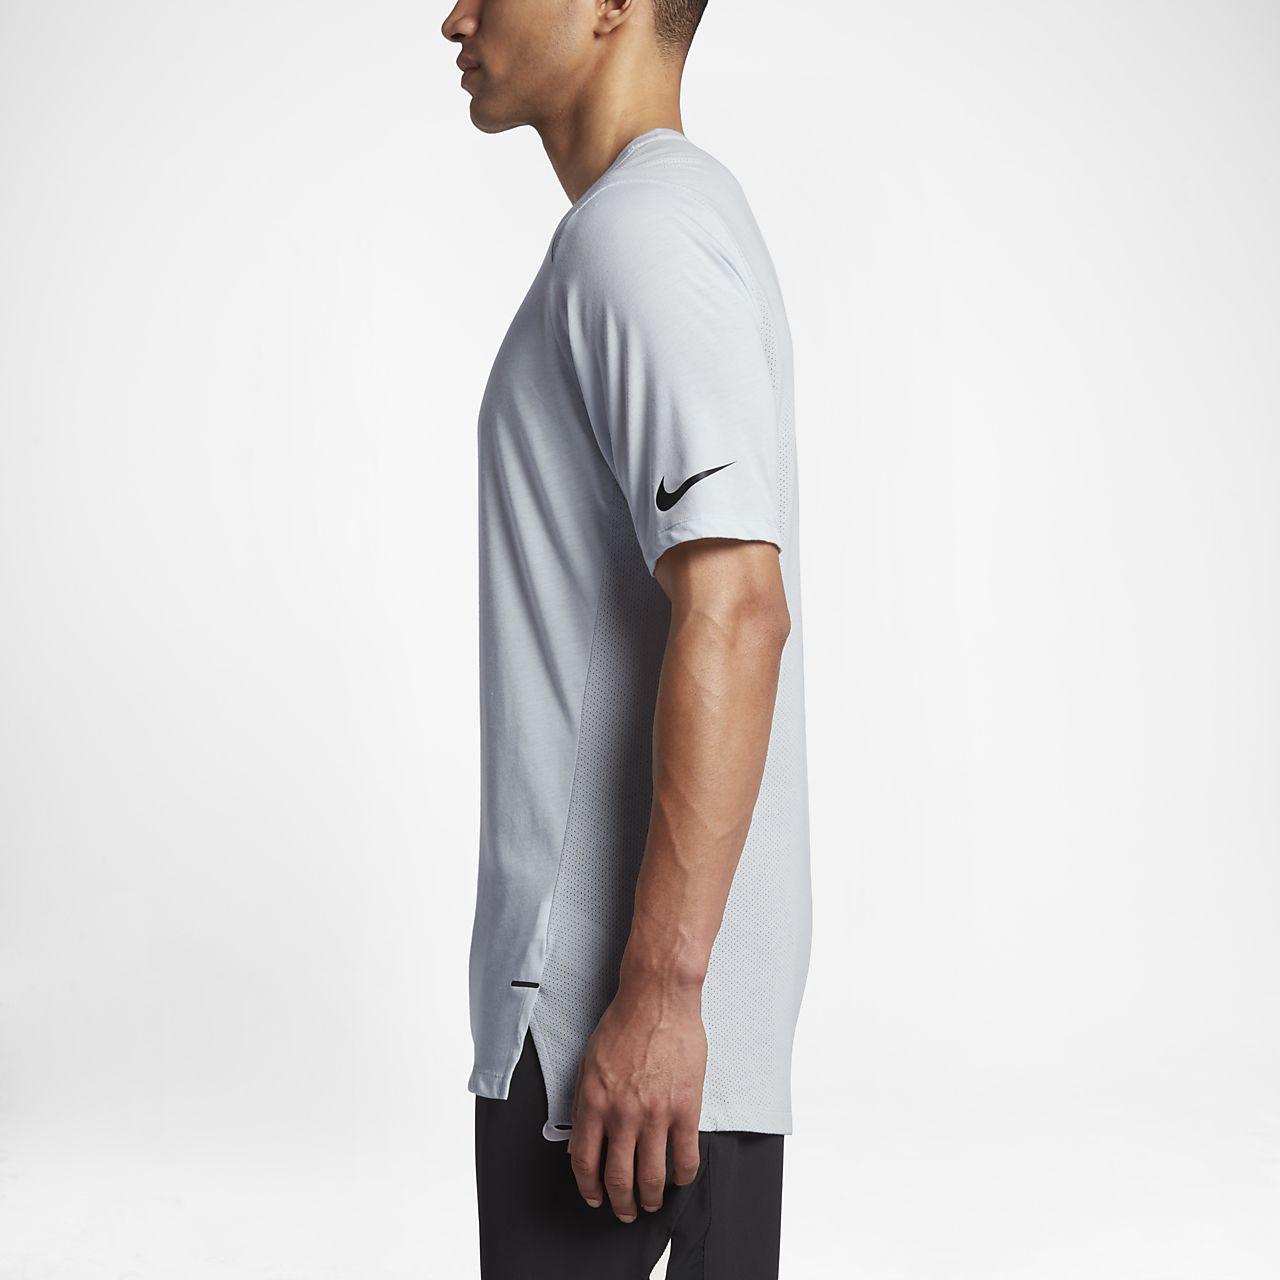 e06047c1 Nike Elite Men's Short-Sleeve Basketball Top. Nike.com ZA